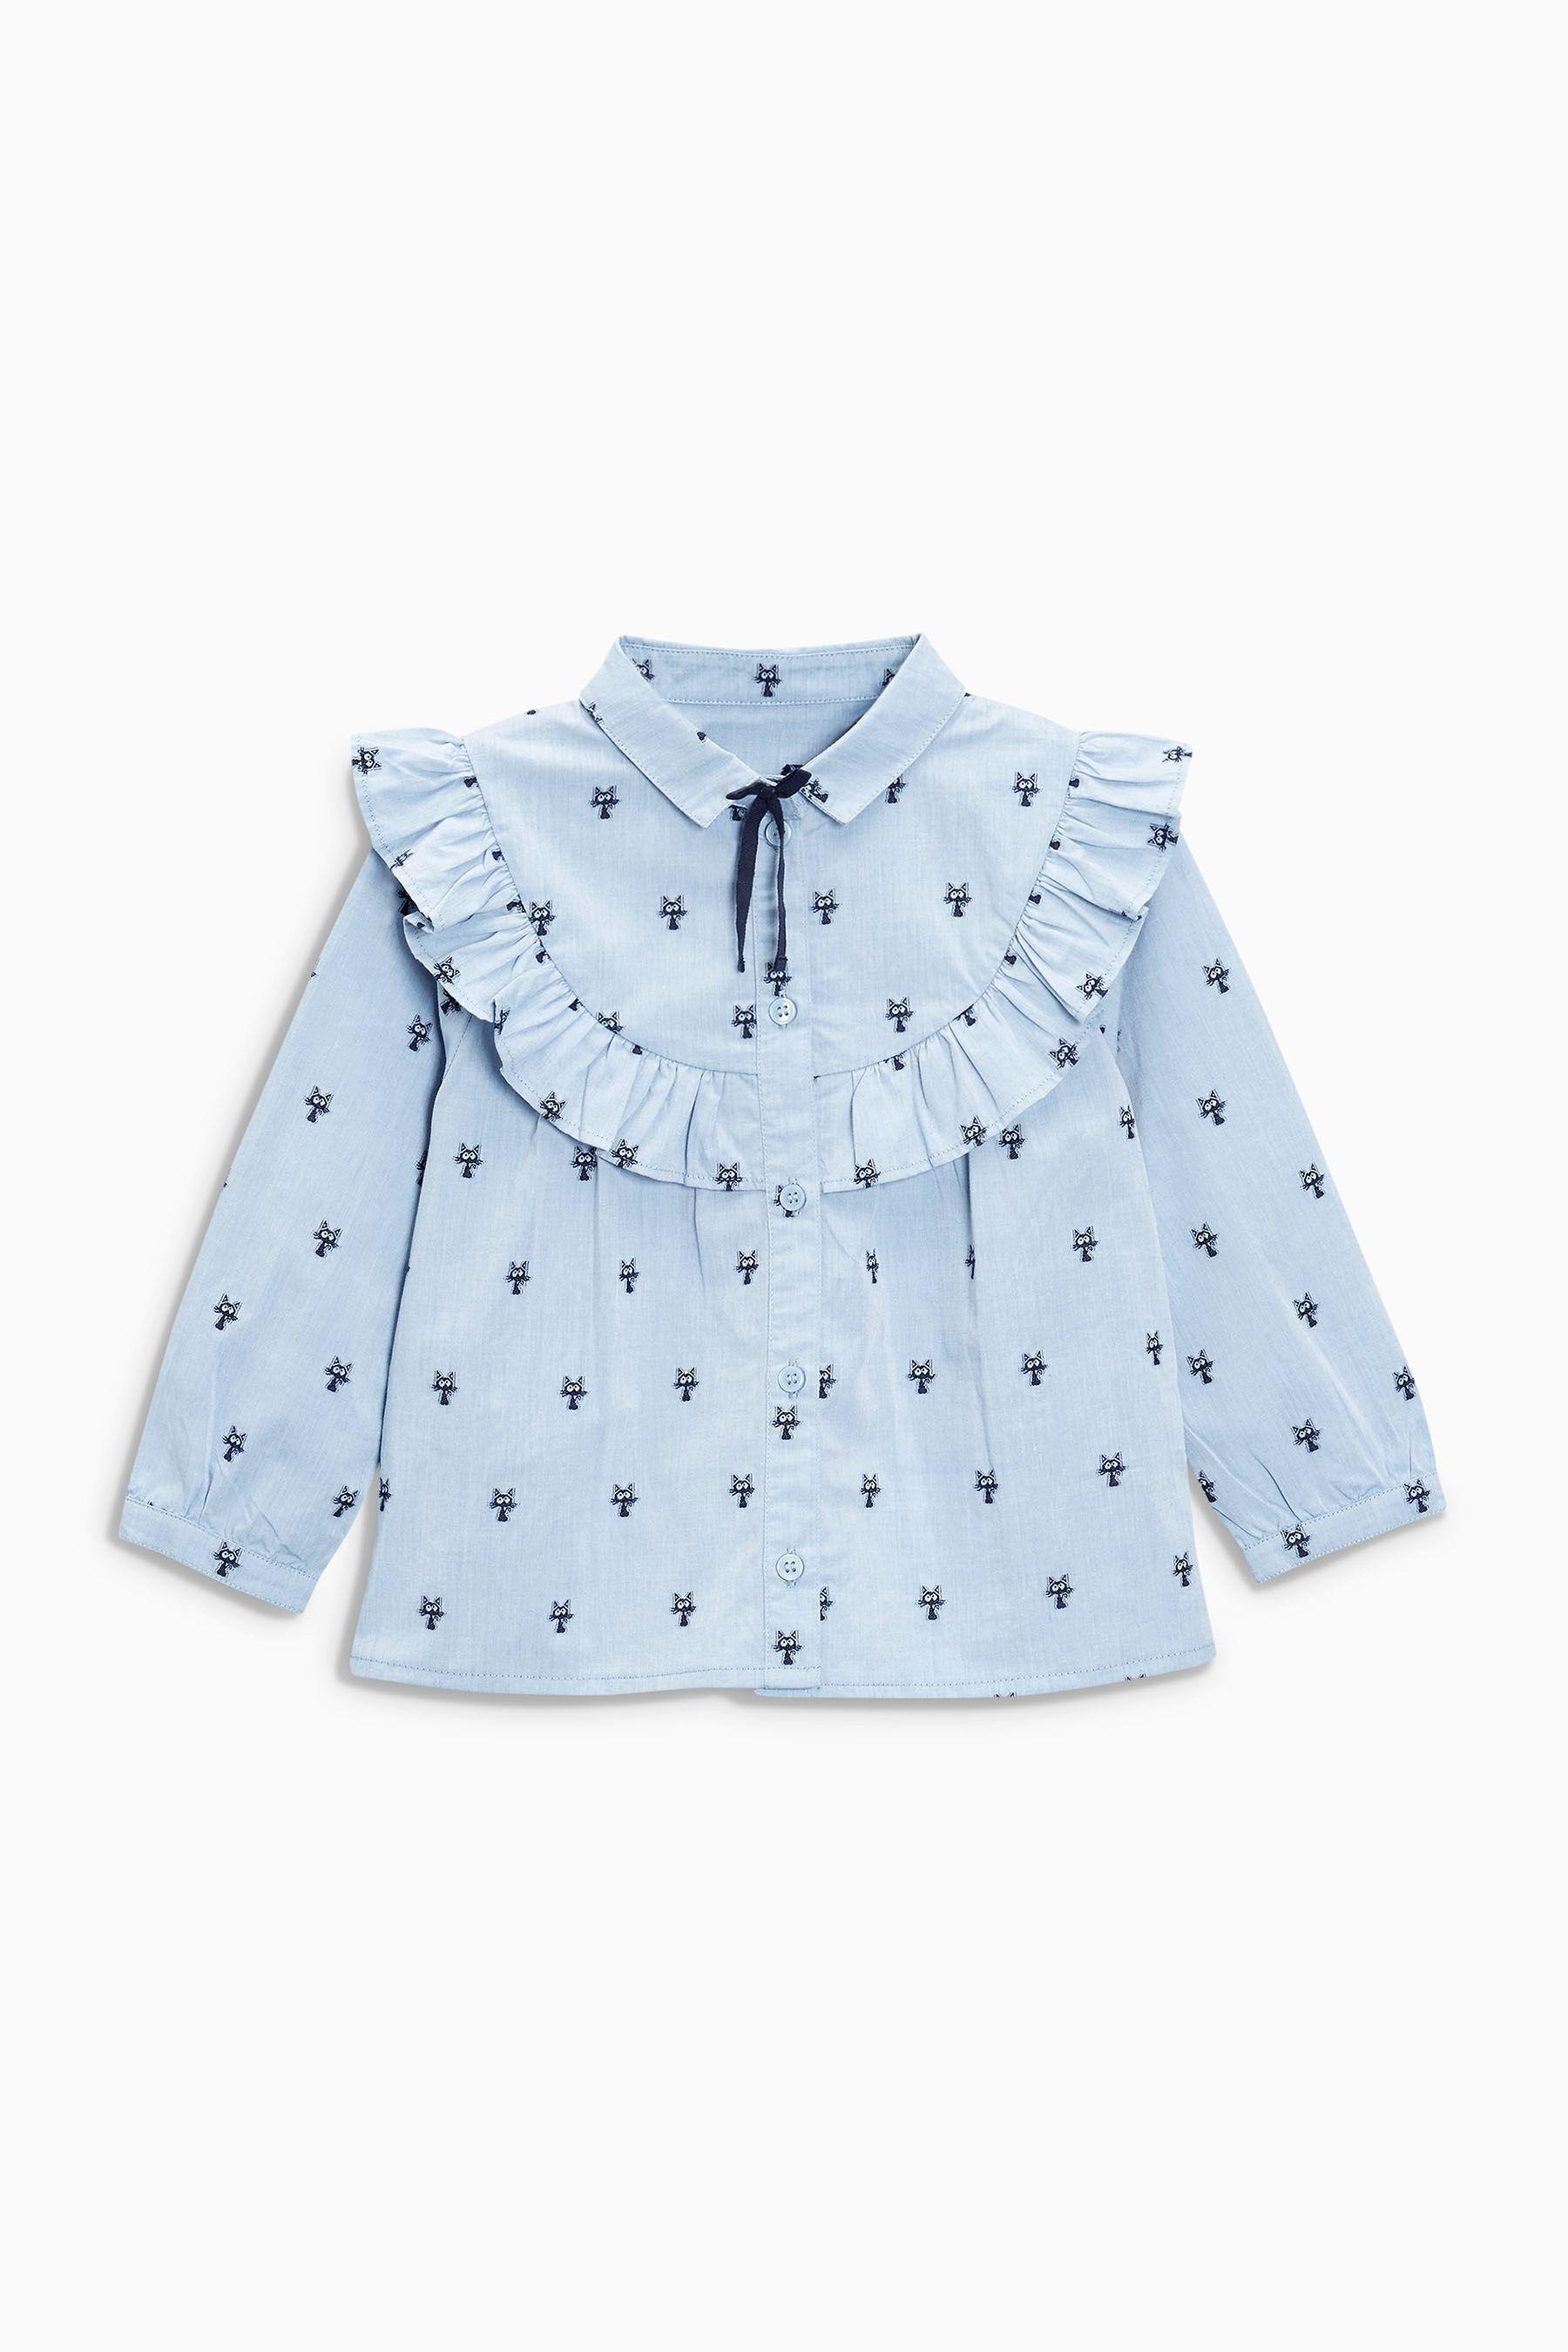 Buy Blue Cat Jacquard Shirt (3mths-6yrs) from the Next UK online shop